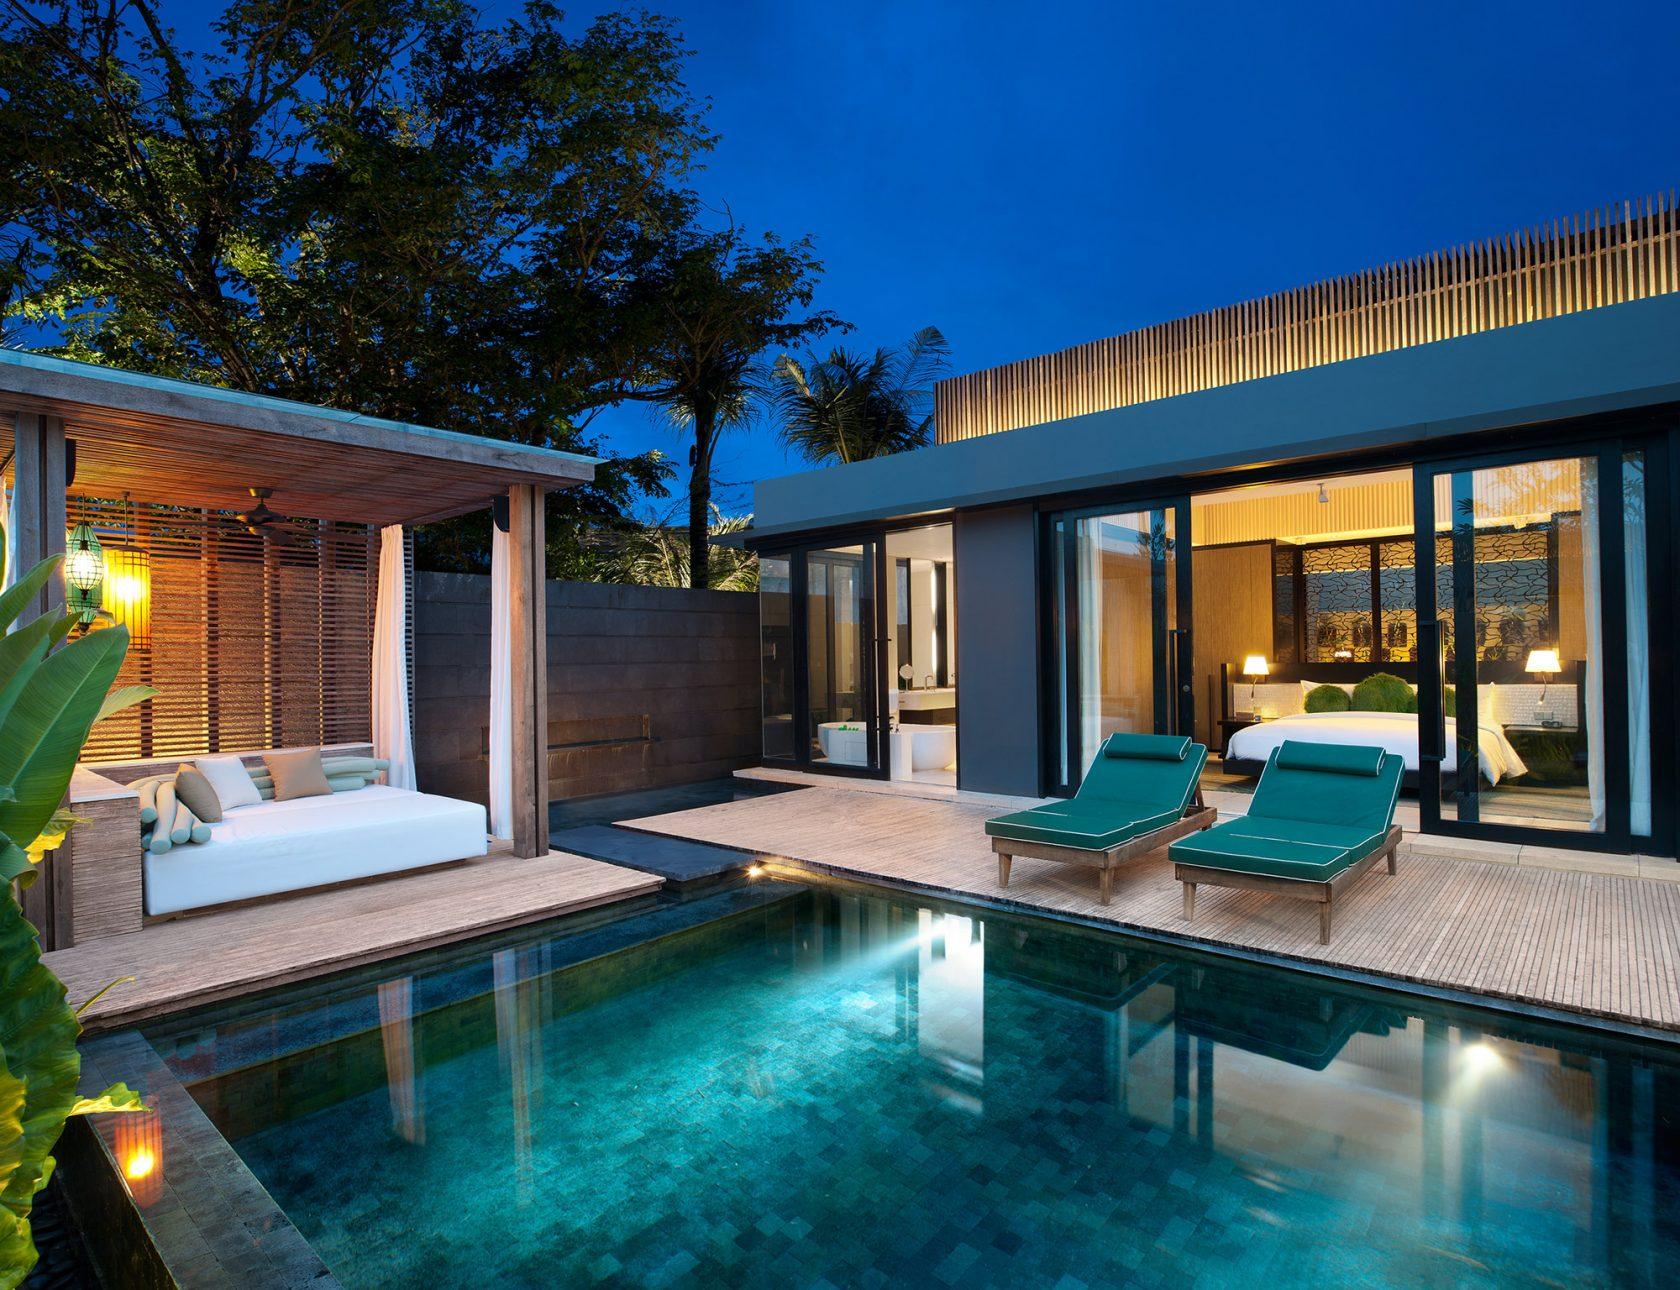 W Bali Seminyak – Marvelous 1 Bedroom Villa mit Pool